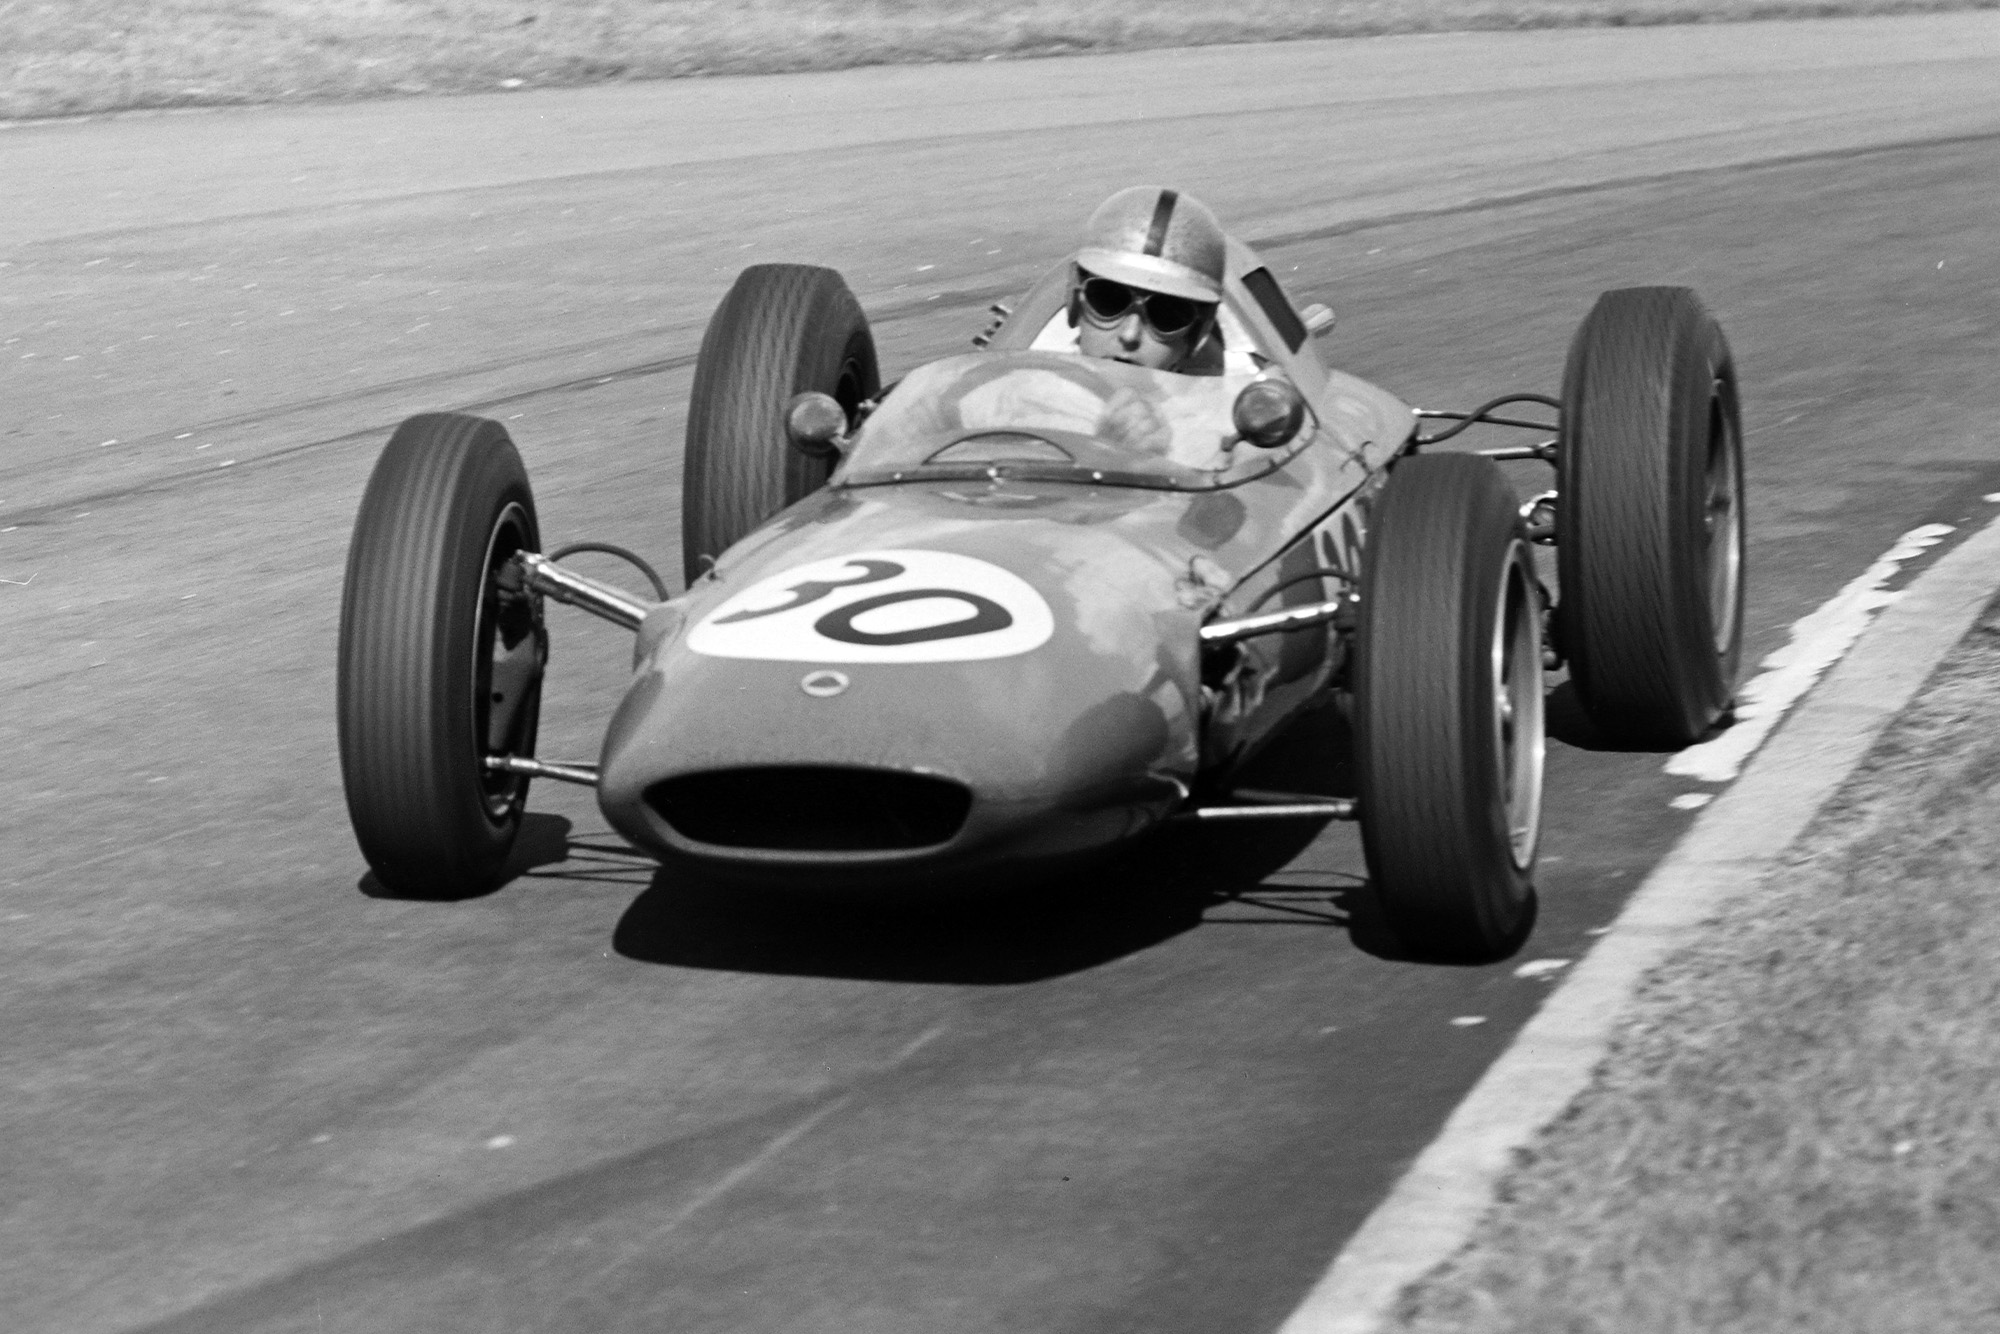 Jack Brabham's Lotus 24